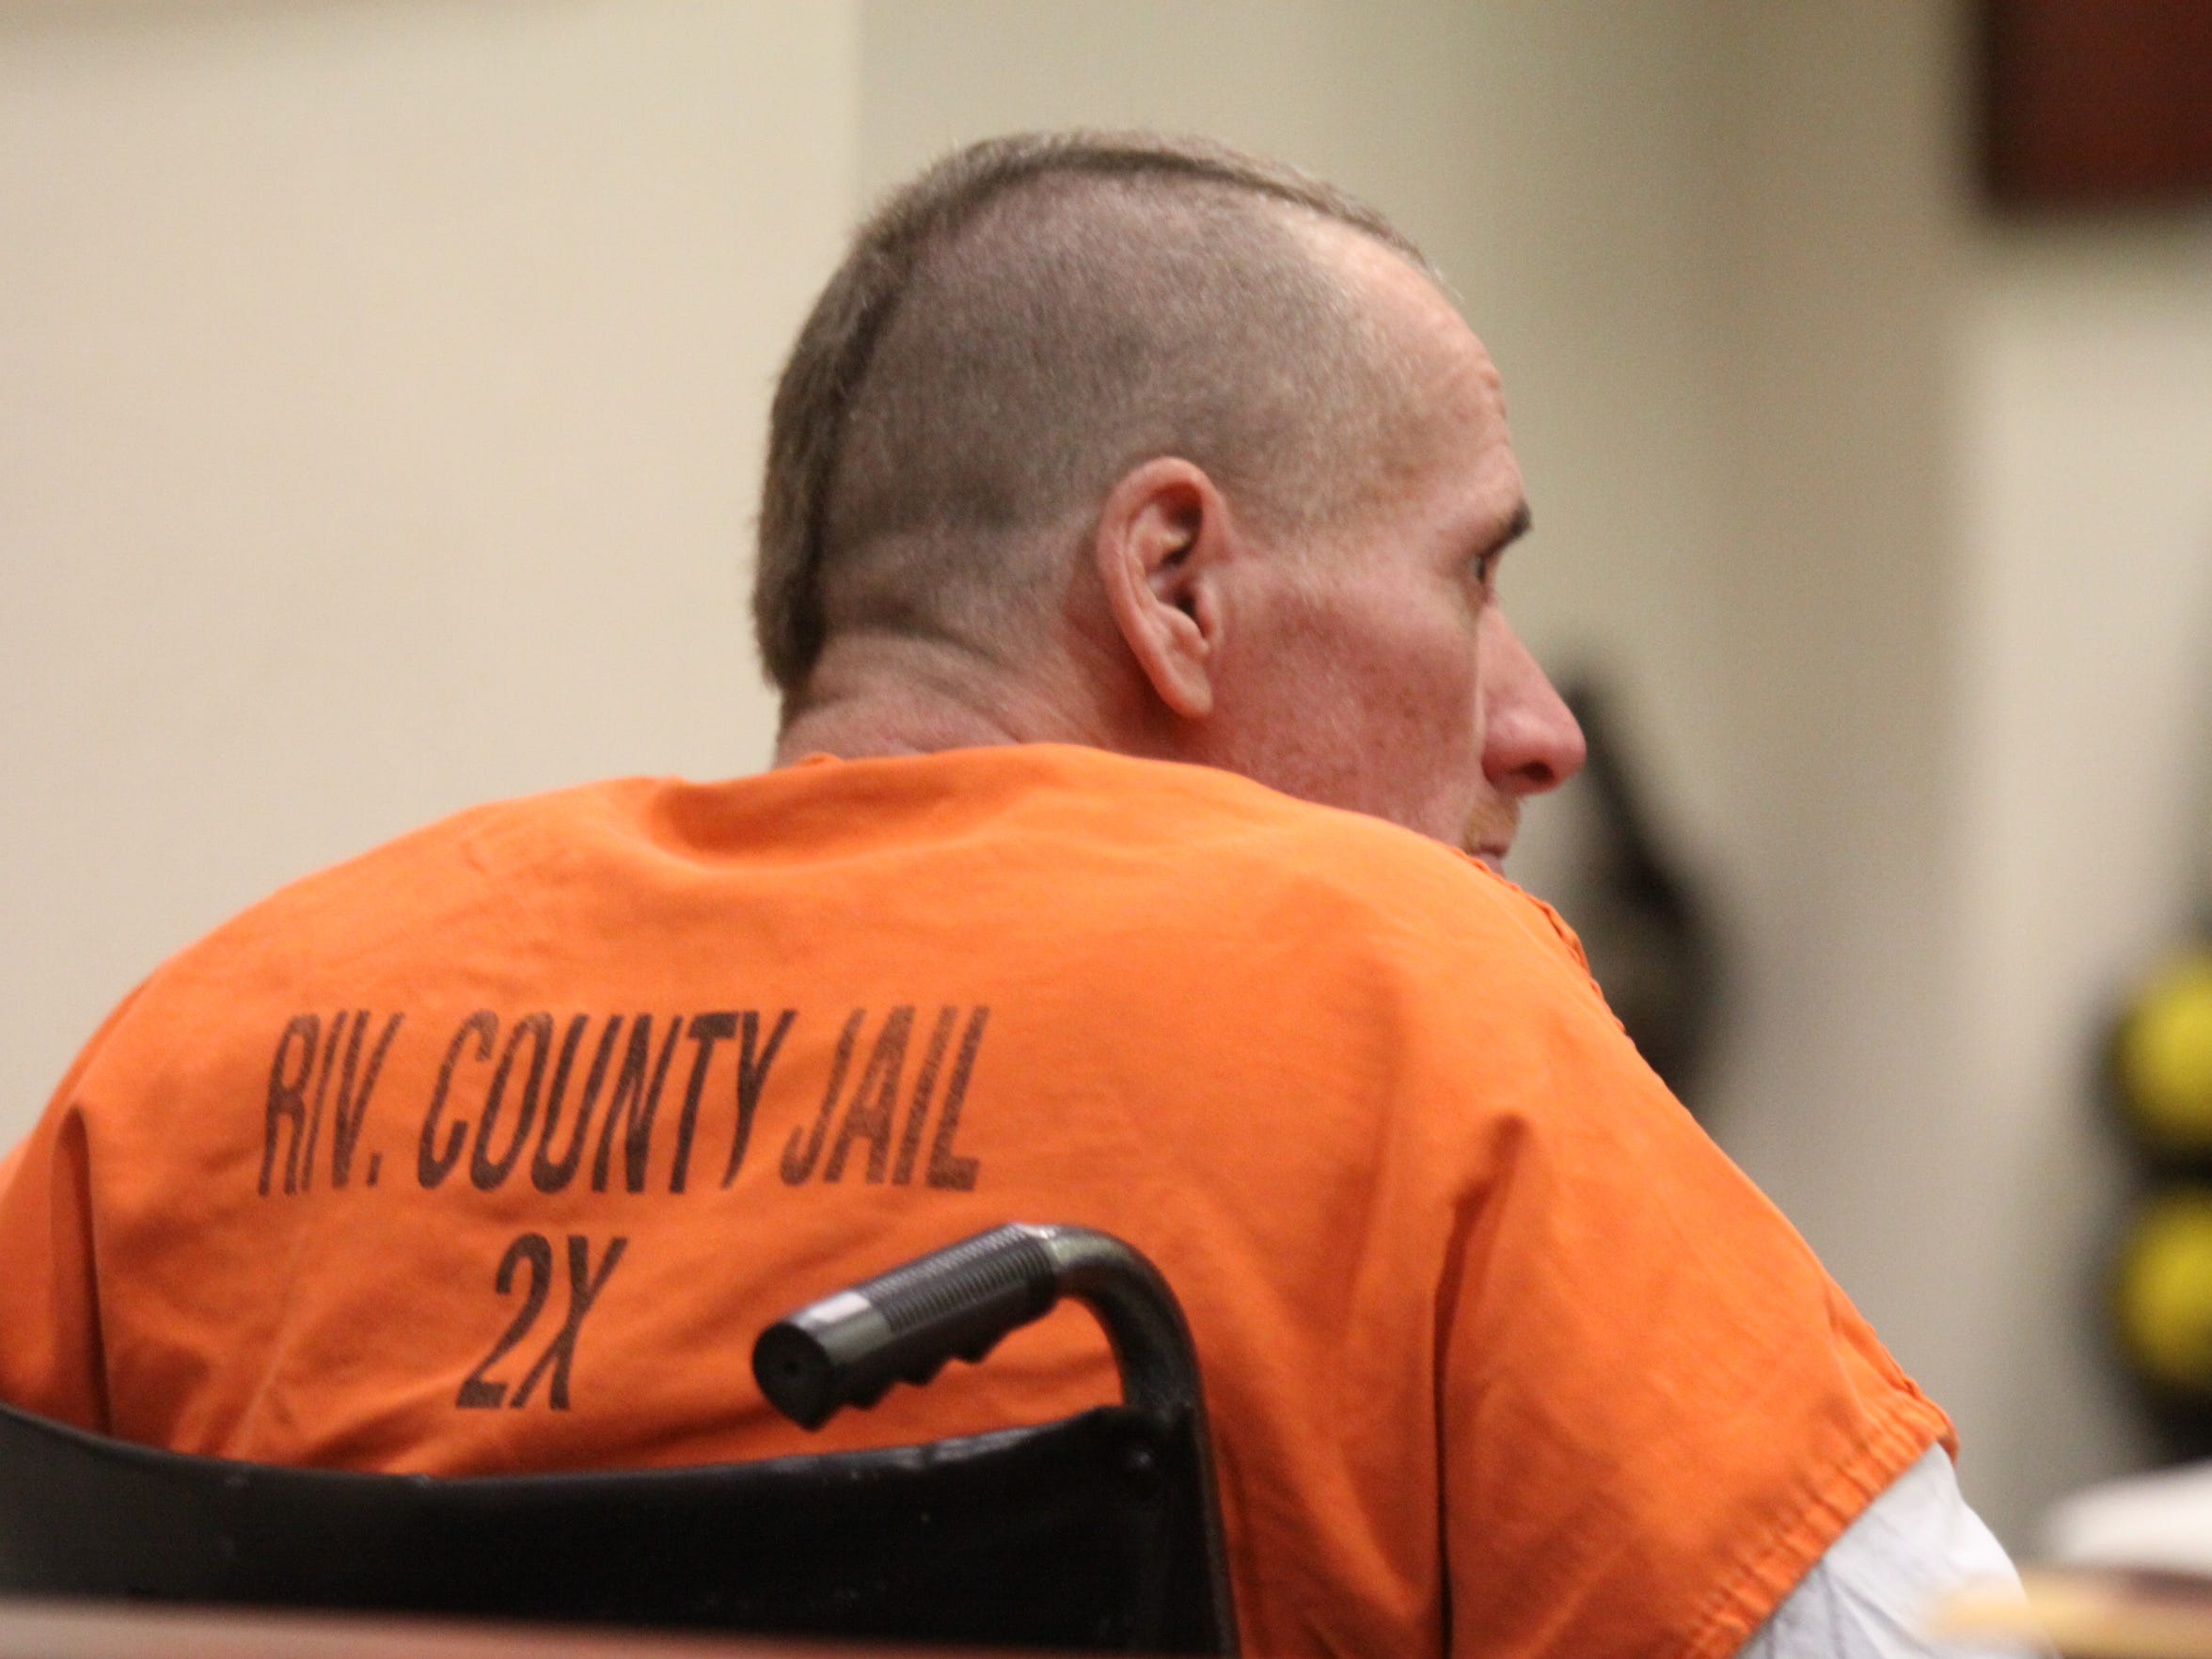 Julio Hoyos, a prolific thief in Riverside County who